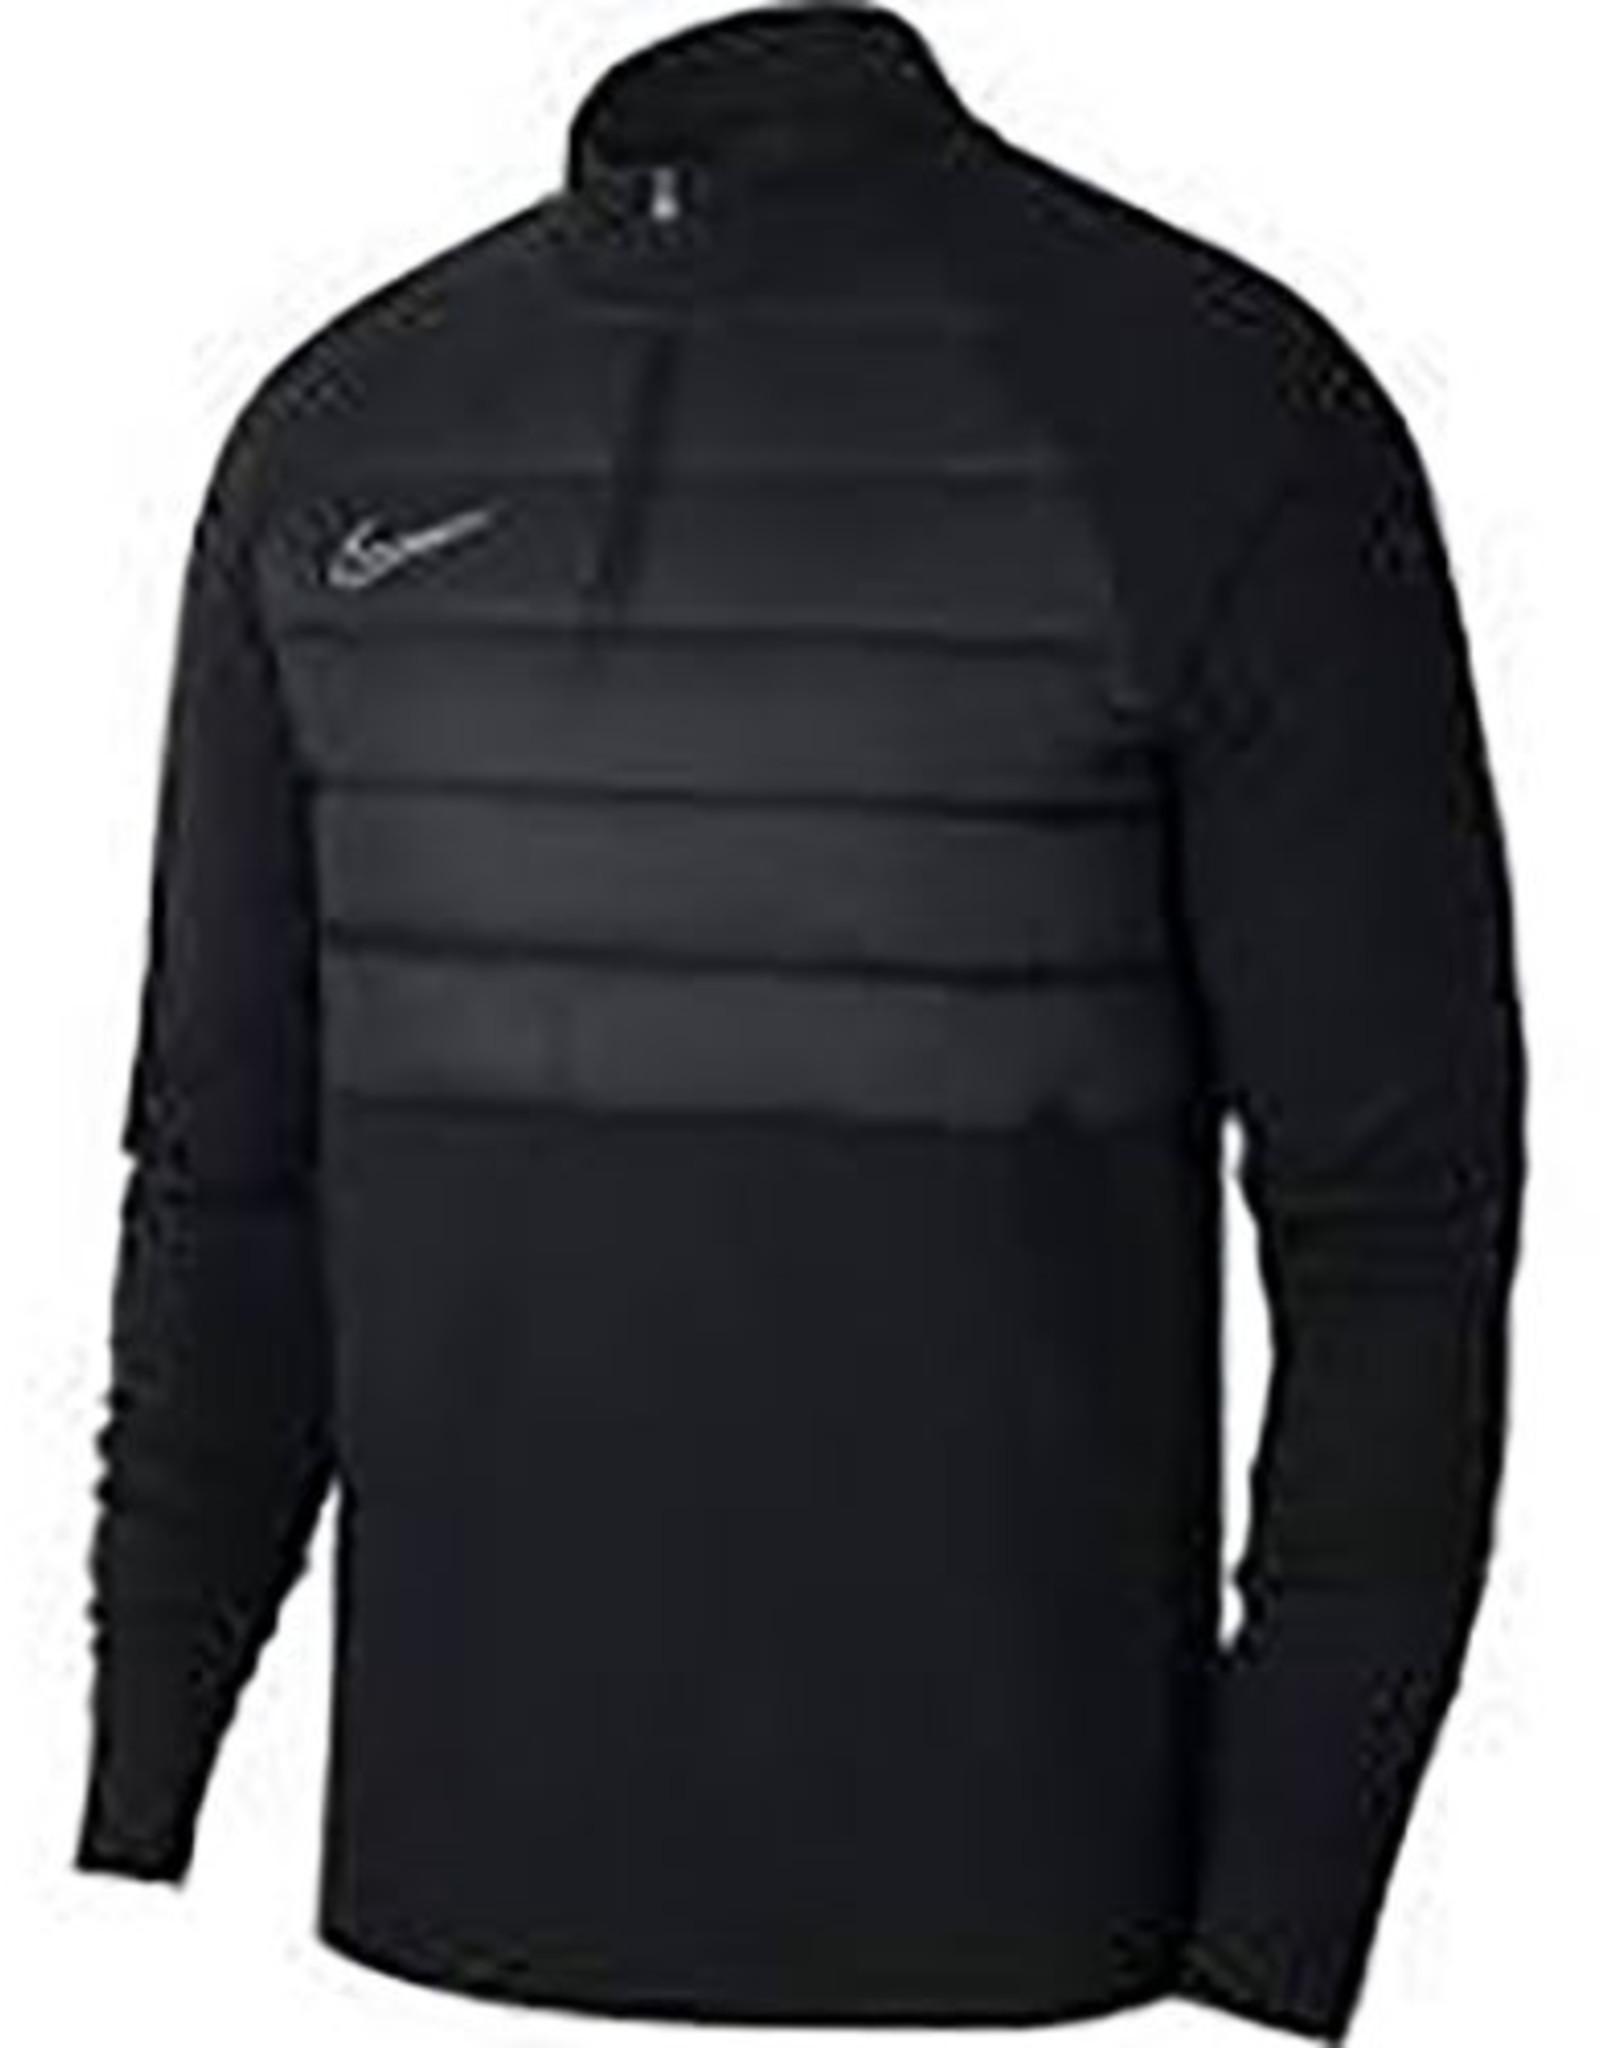 Nike nike trui bq7473